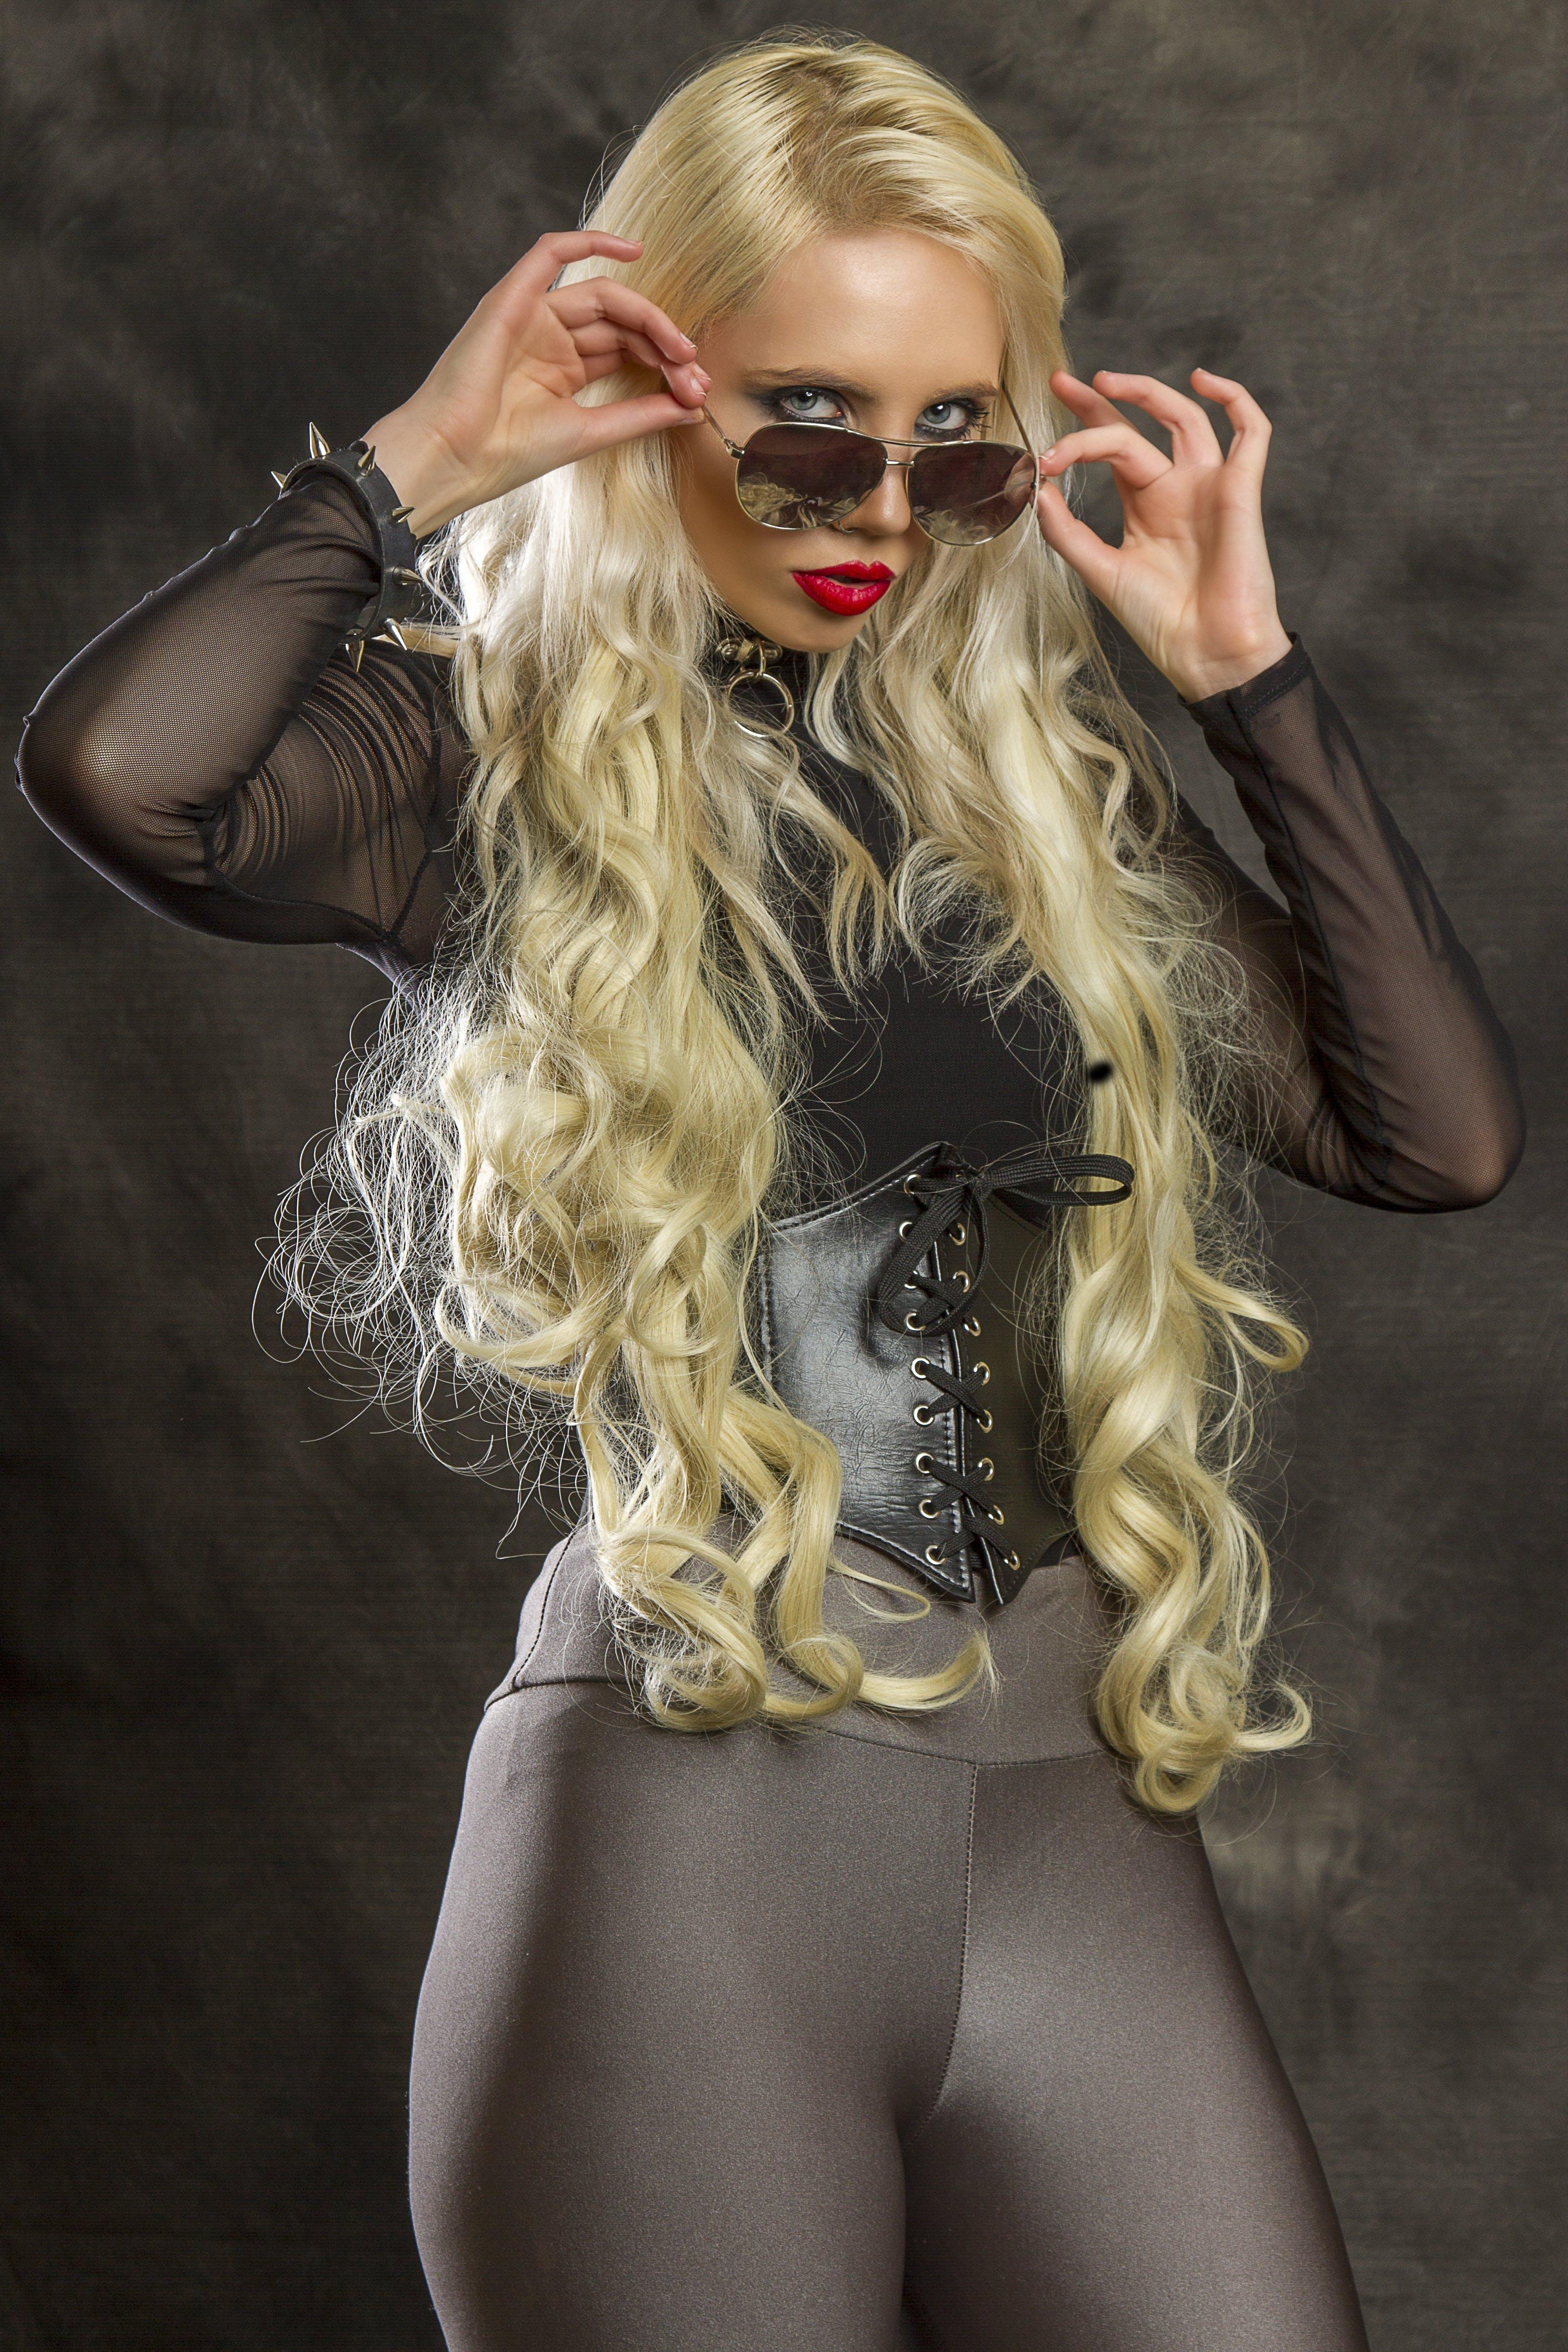 Woman Wearing Black Framed Aviator-style Sunglasses